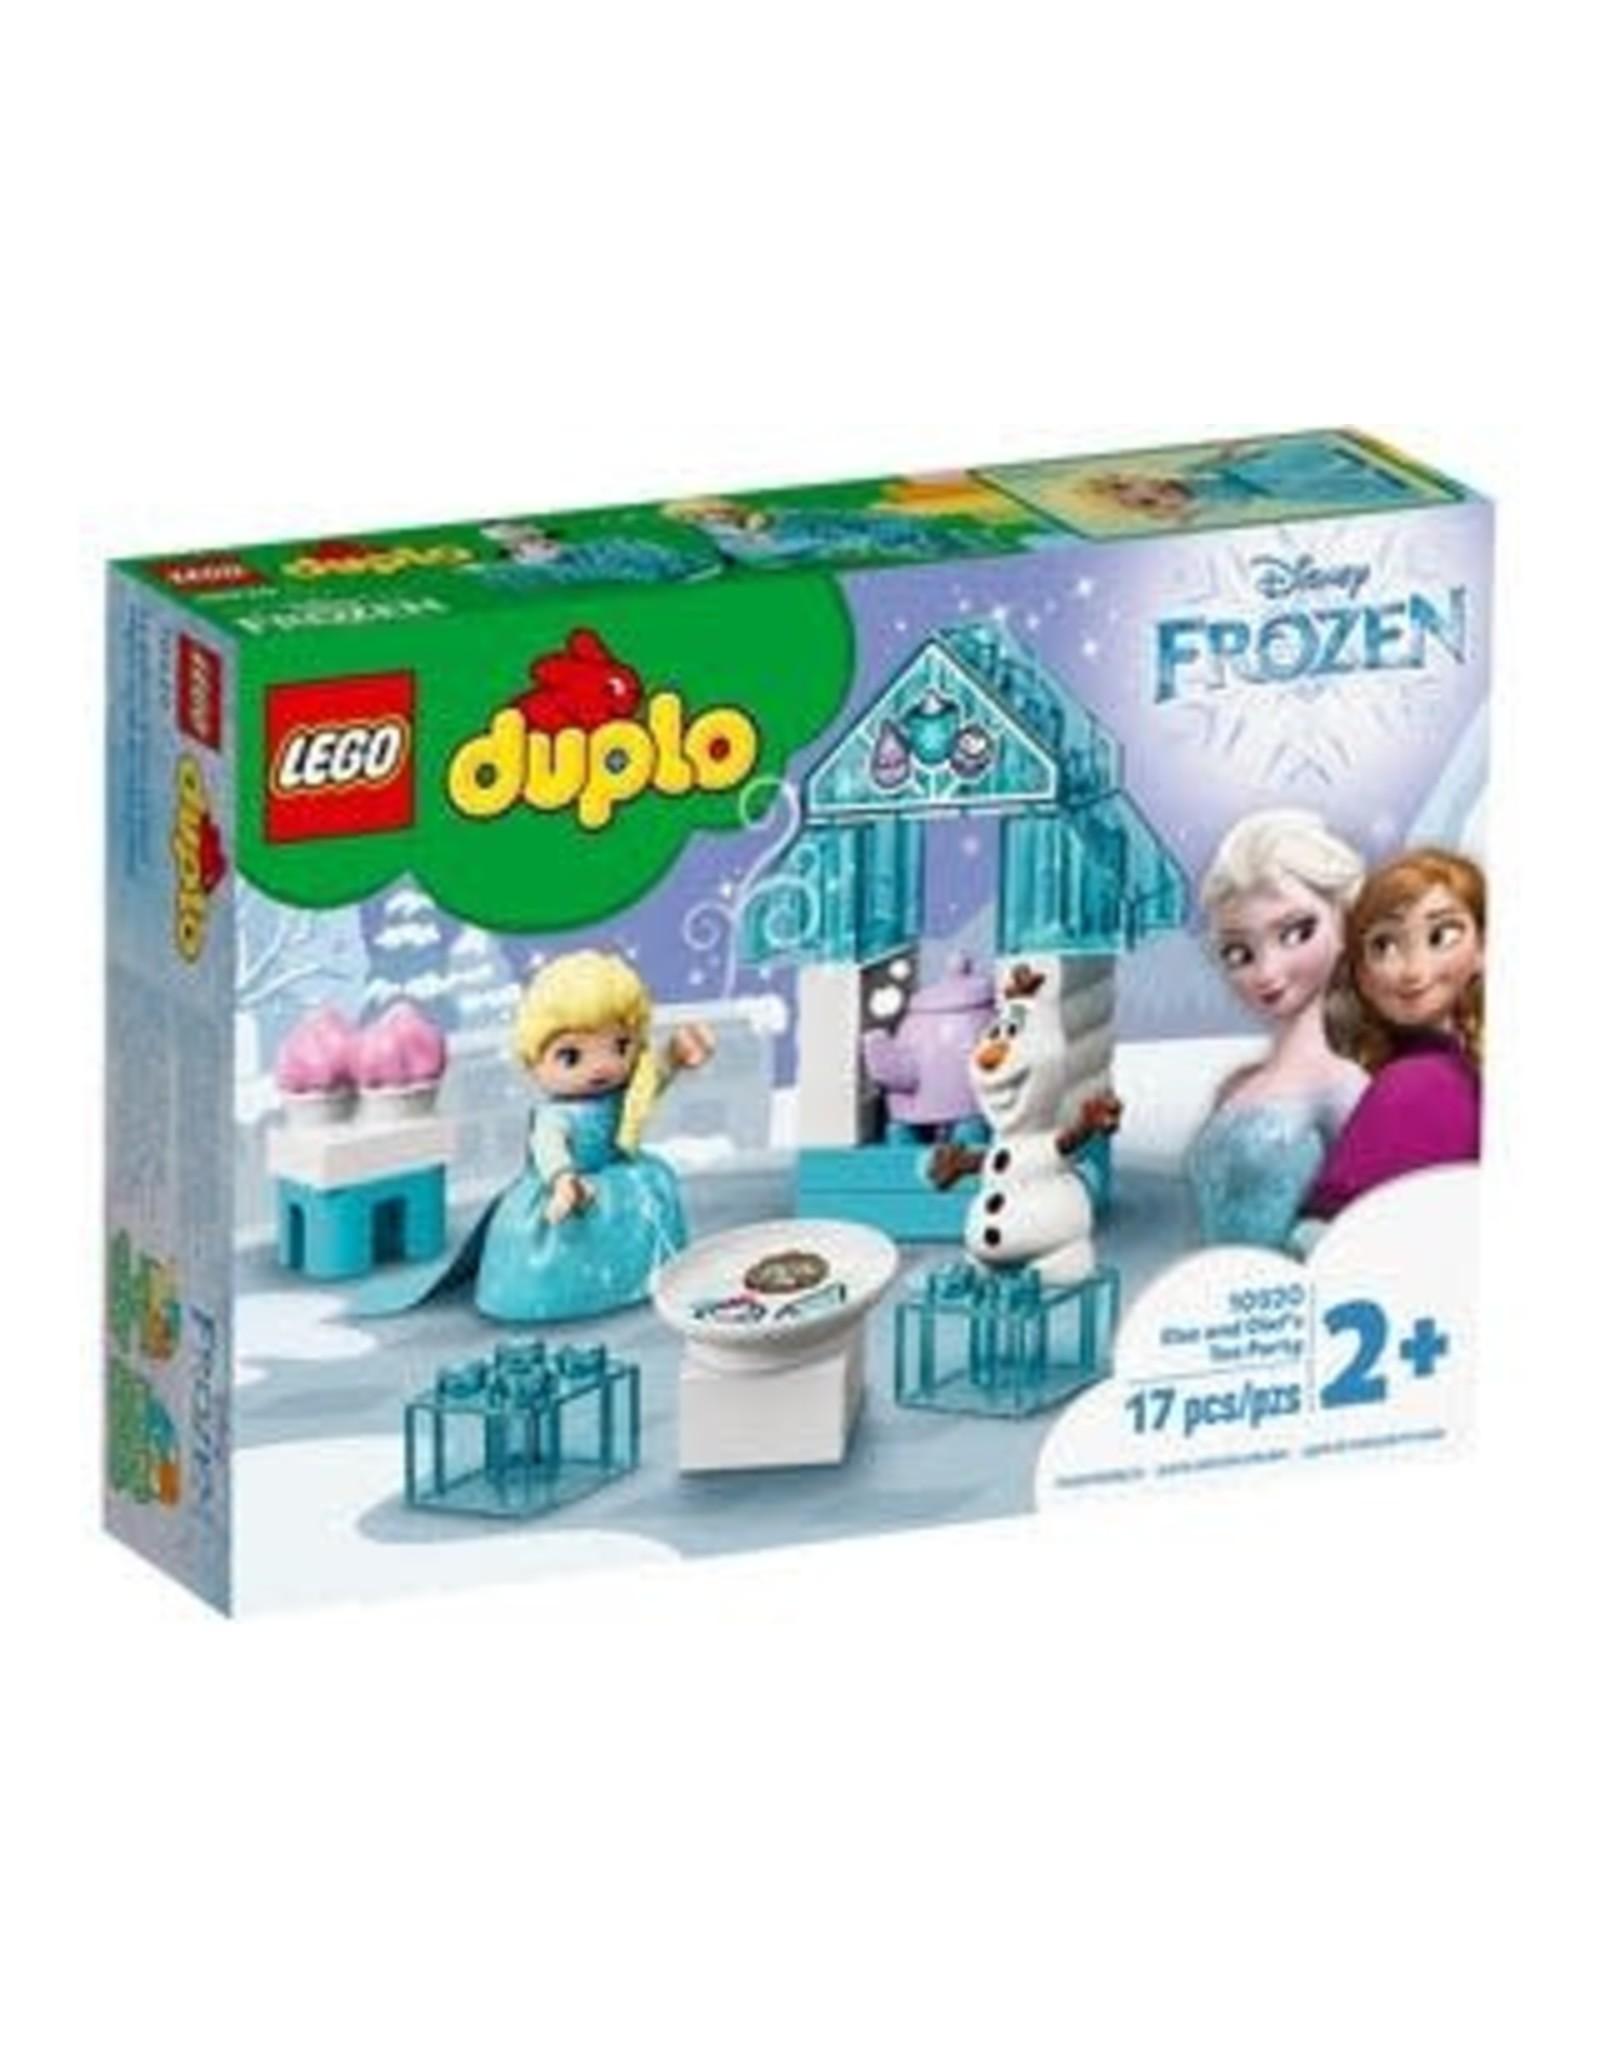 LEGO Lego Duplo: Frozen Elsa and Olaf's Tea Party